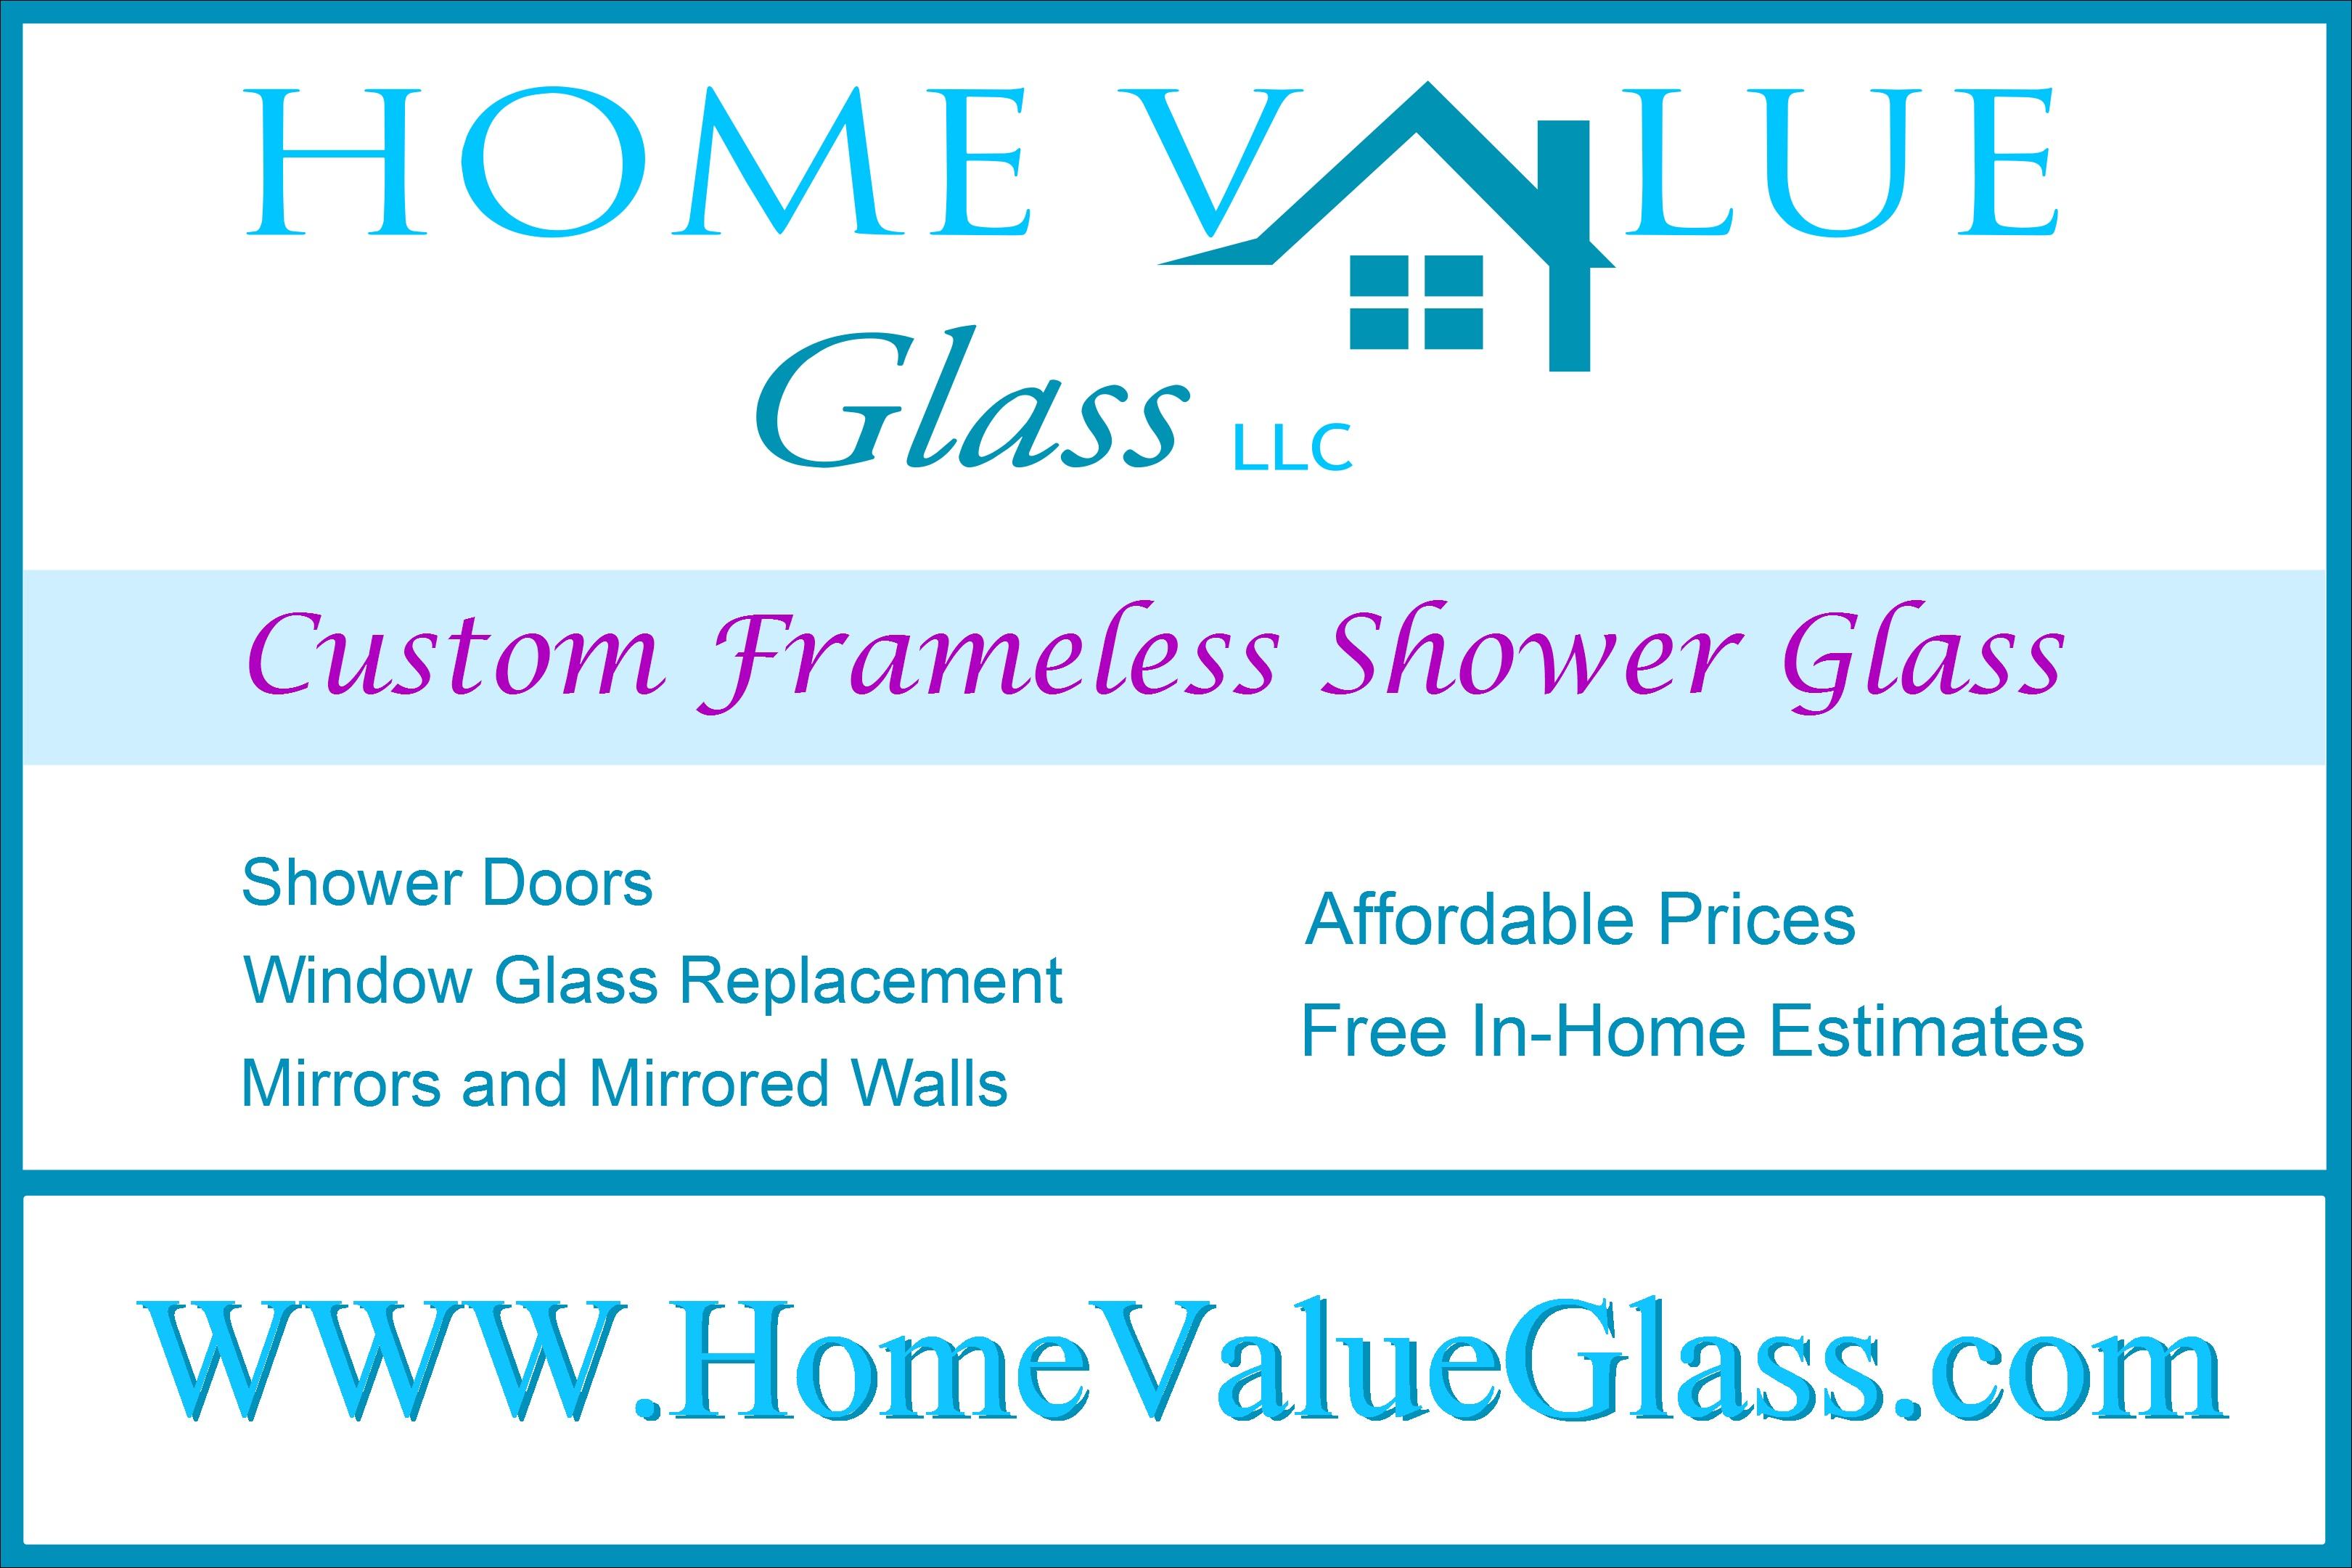 Home Value Glass Llc